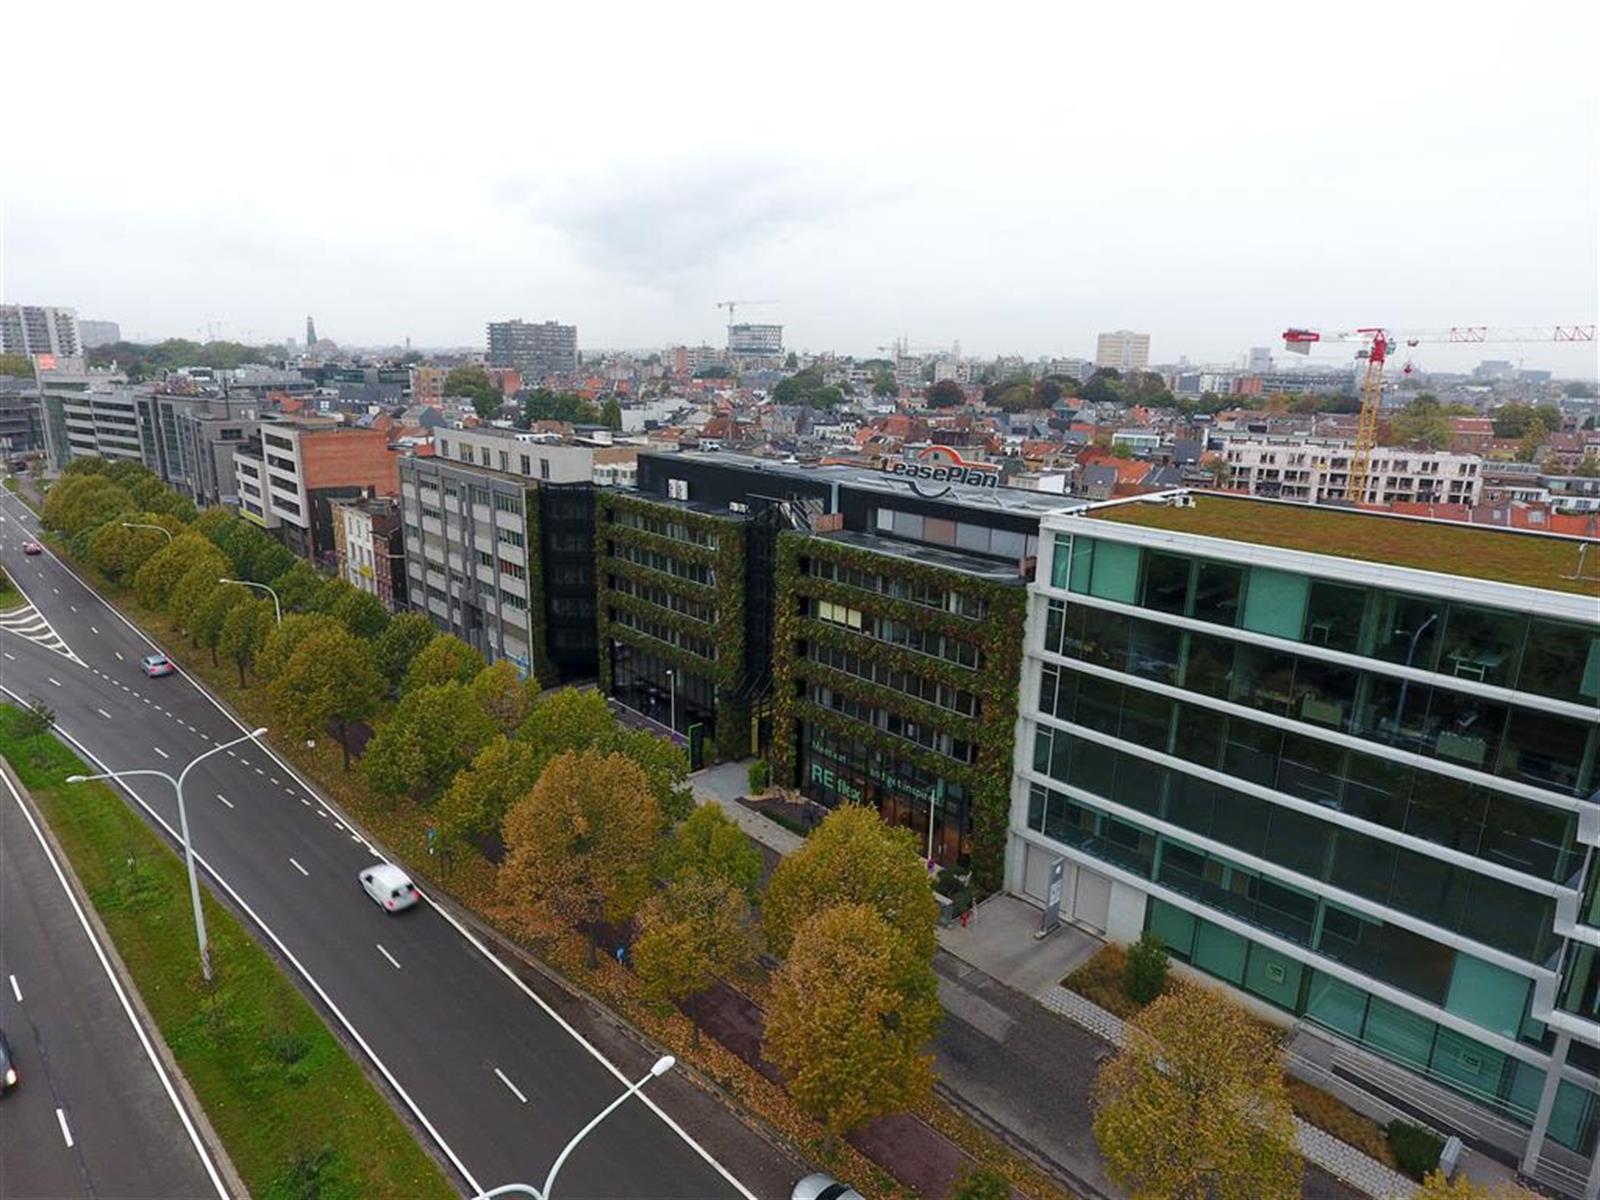 kantoor te huur I125 - Kantoor - Uitbreidingstraat 66, 2600 Antwerpen, België 4